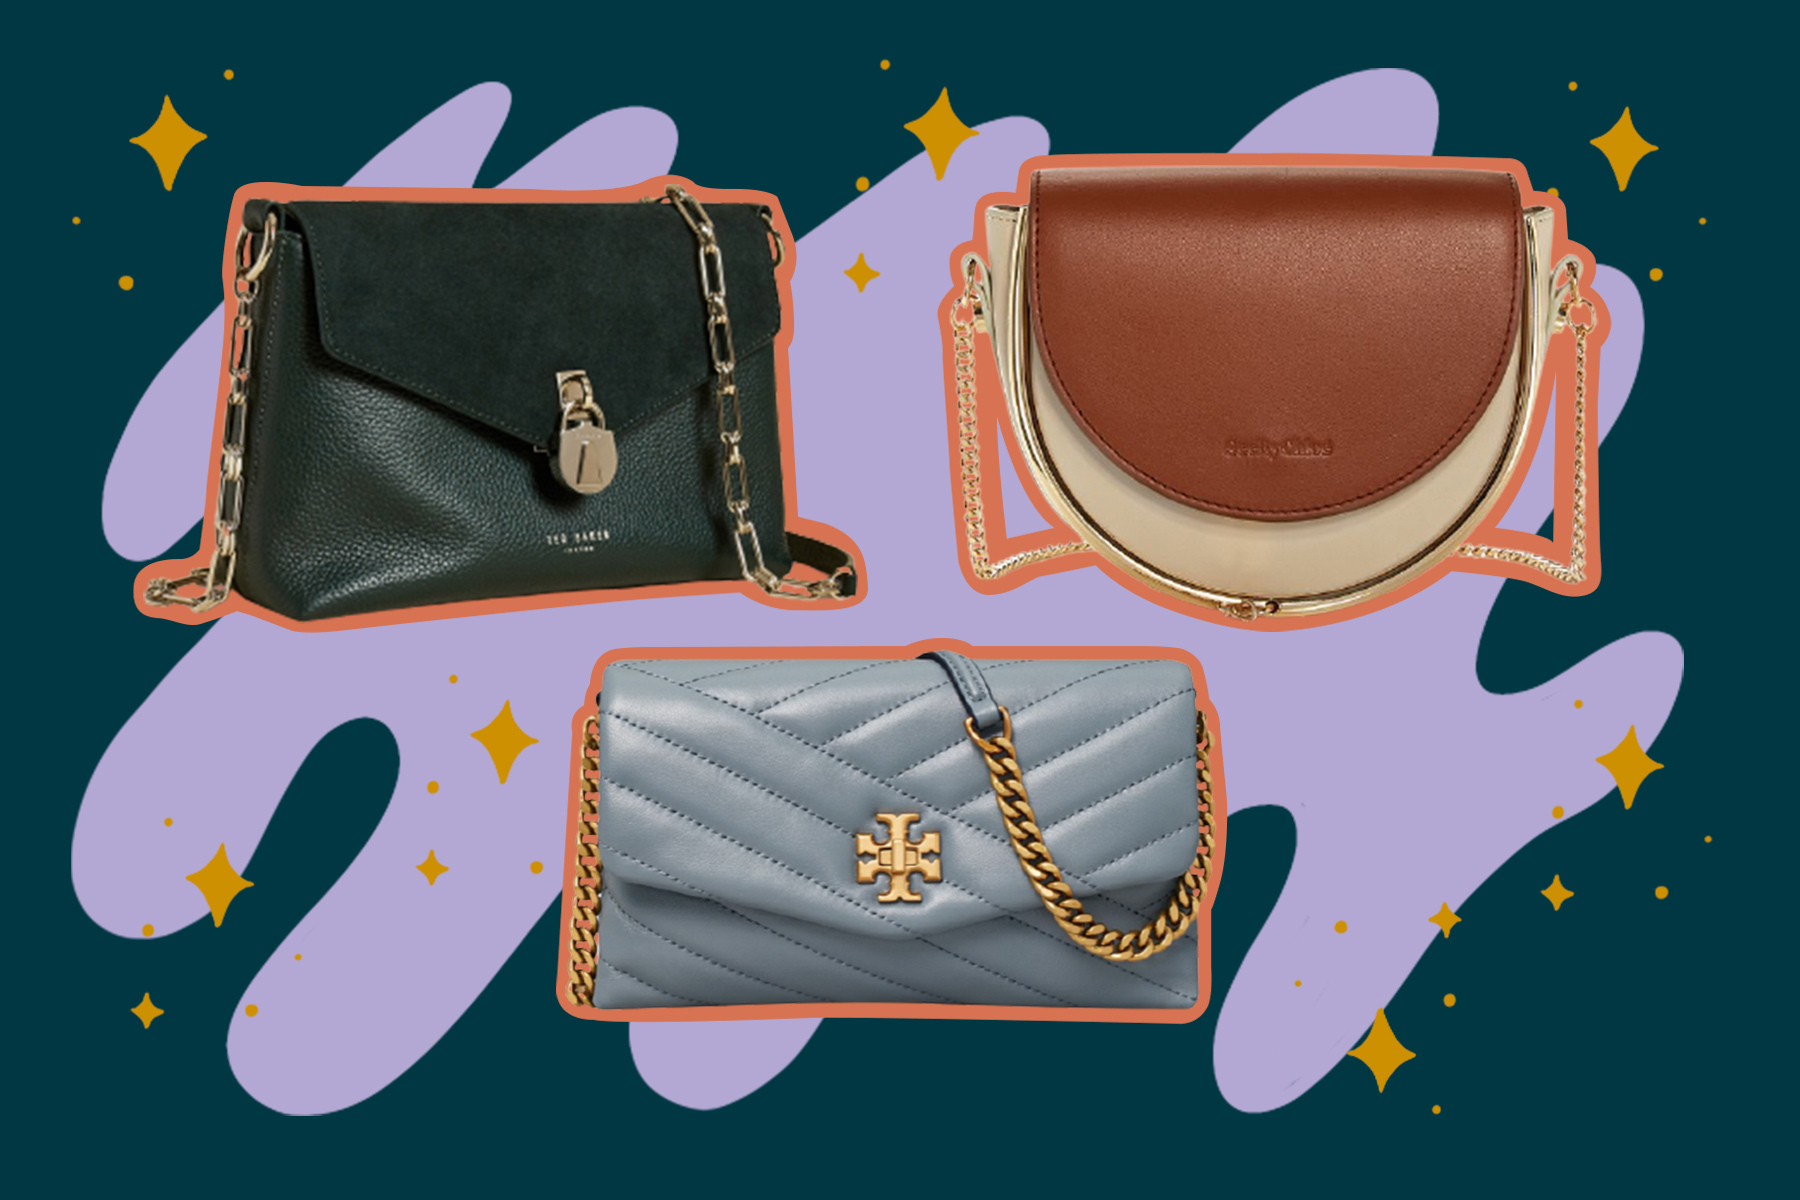 designer handbag based on zodiac sign